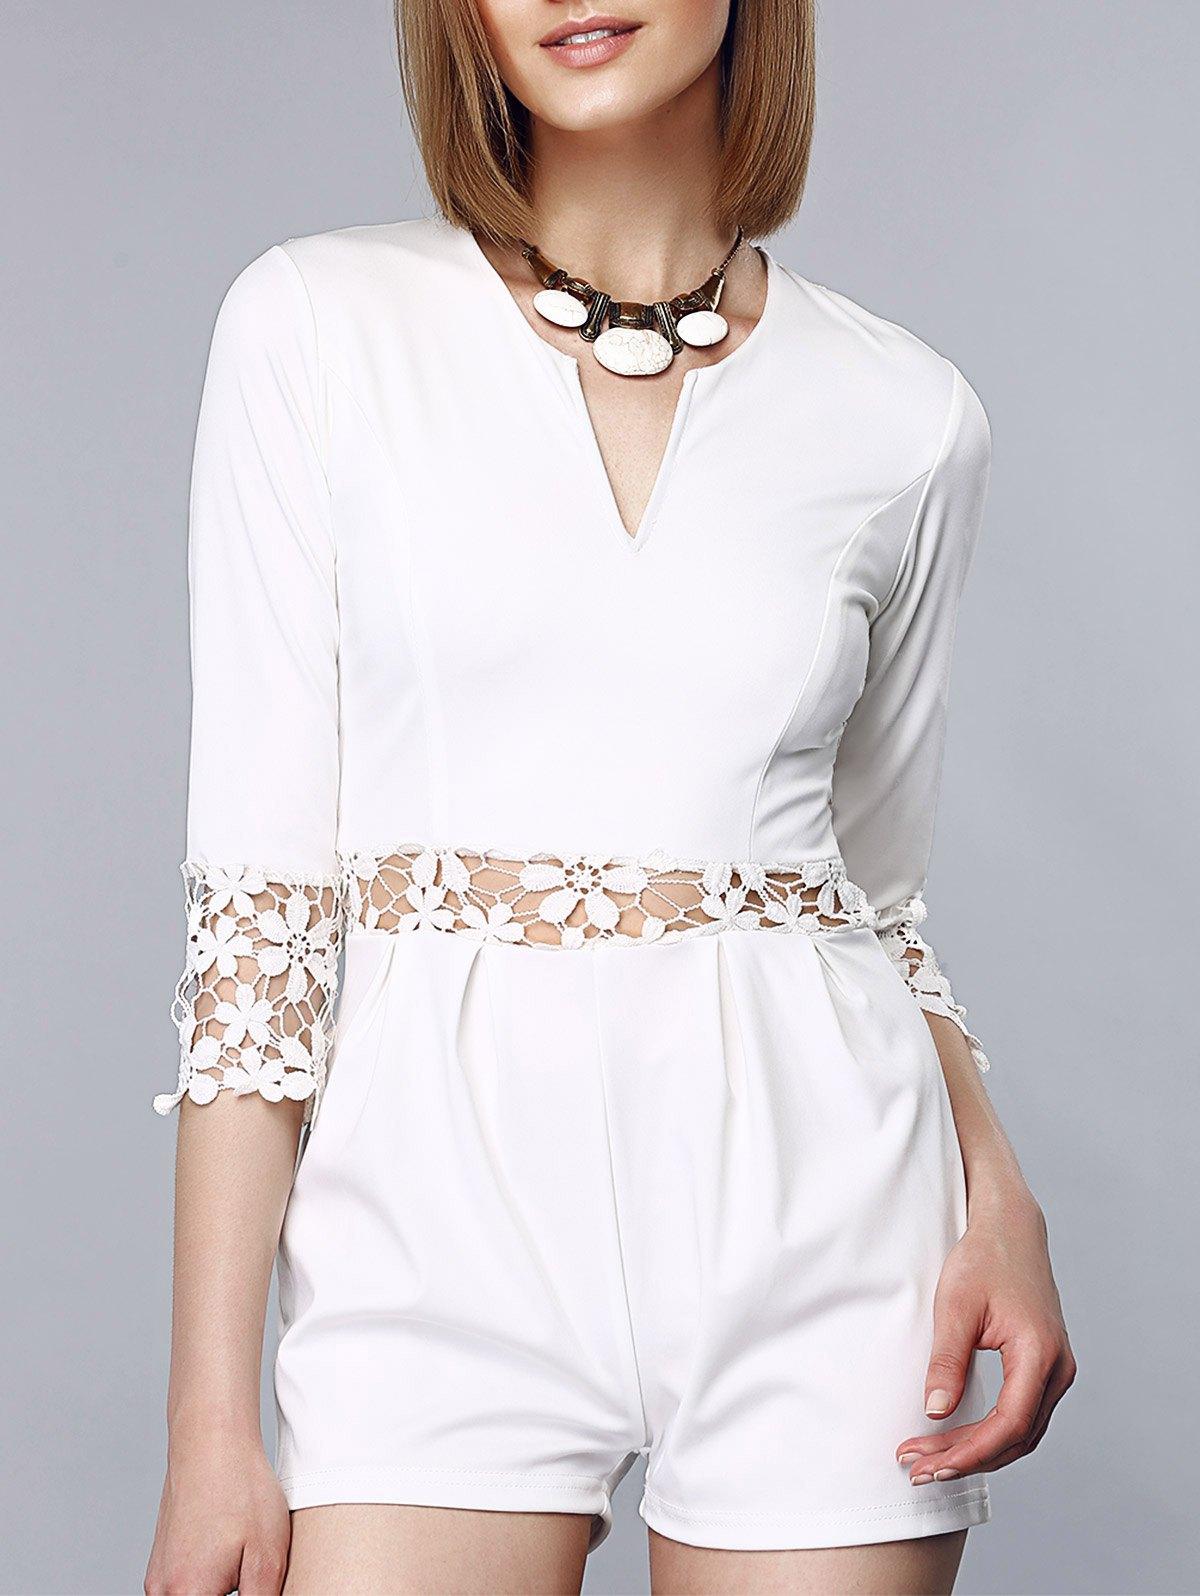 Stylish Notch Collar 3/4 Sleeves Crochet Romper For Women